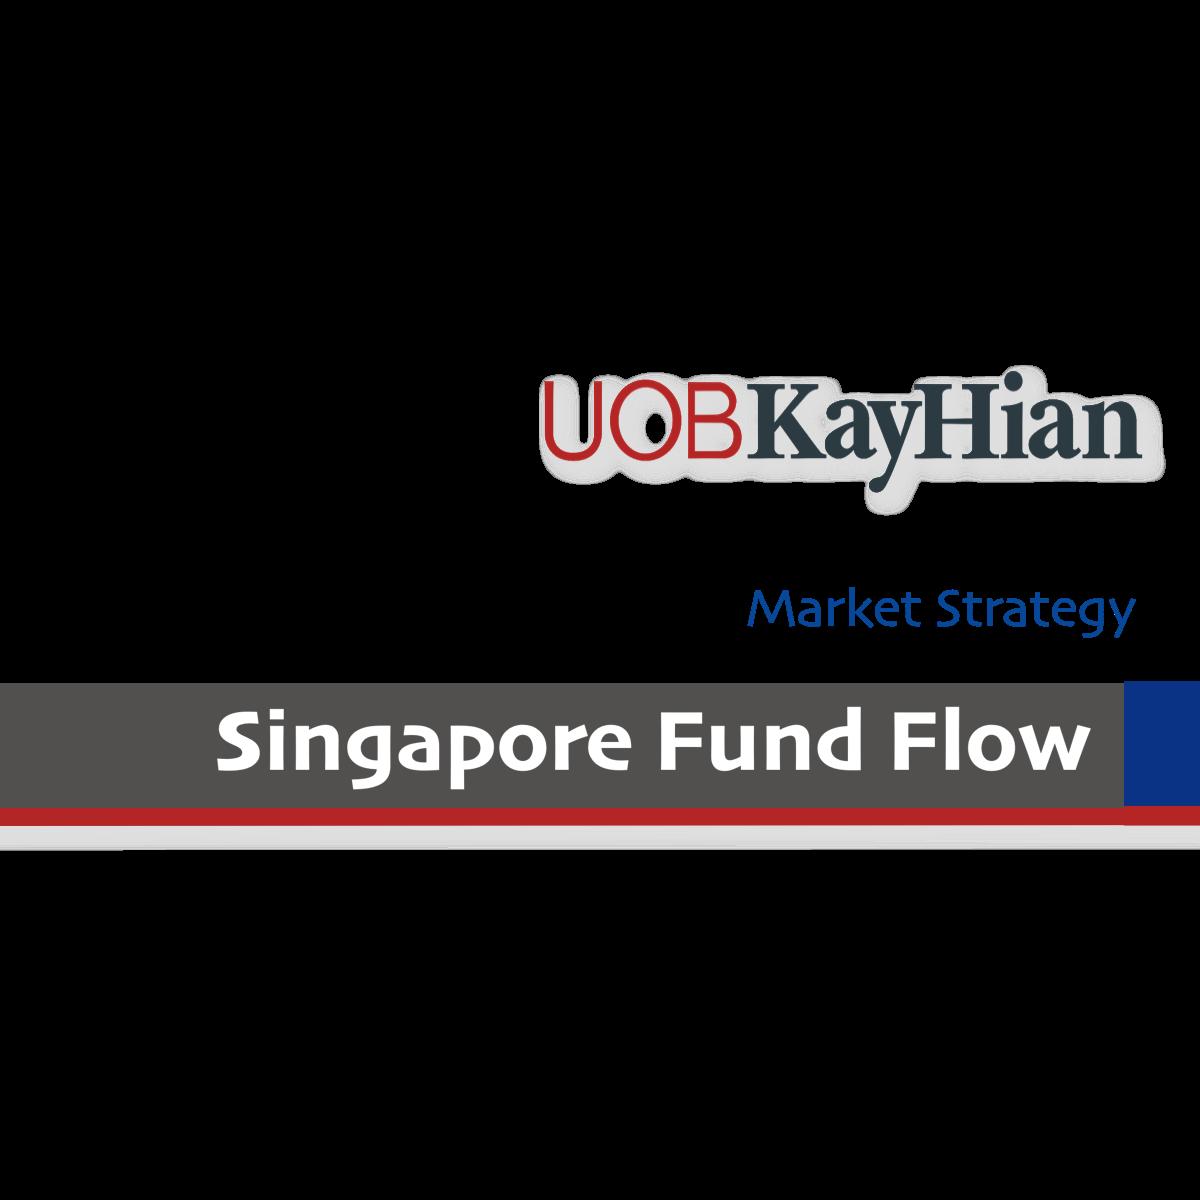 Singapore Fund Flow Strategy - UOB Kay Hian | SGinvestors.io